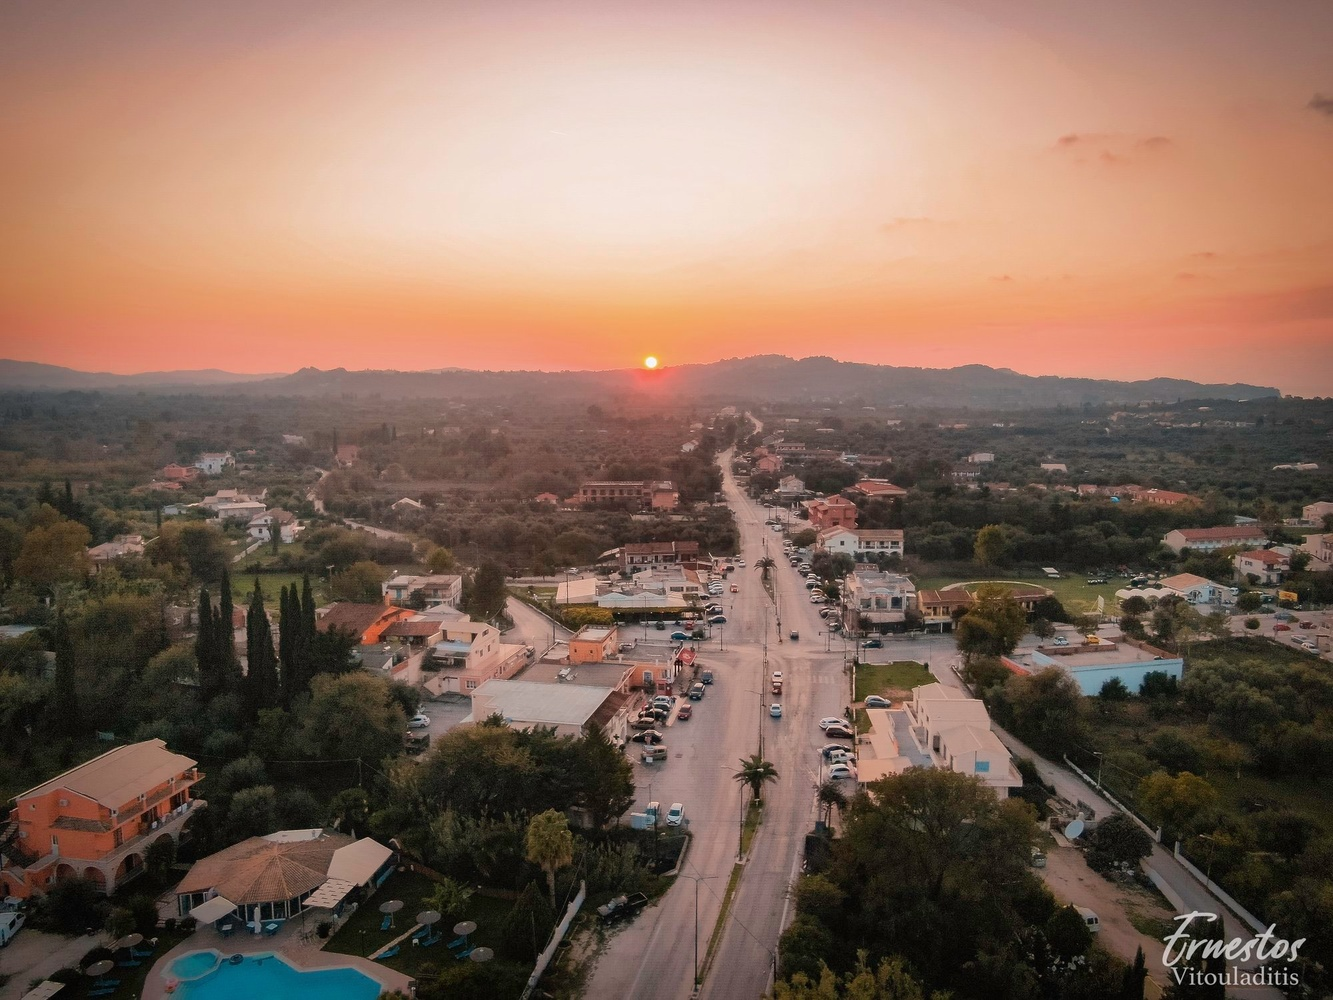 Sunset in Roda, Corfu by ernestos vitouladitis